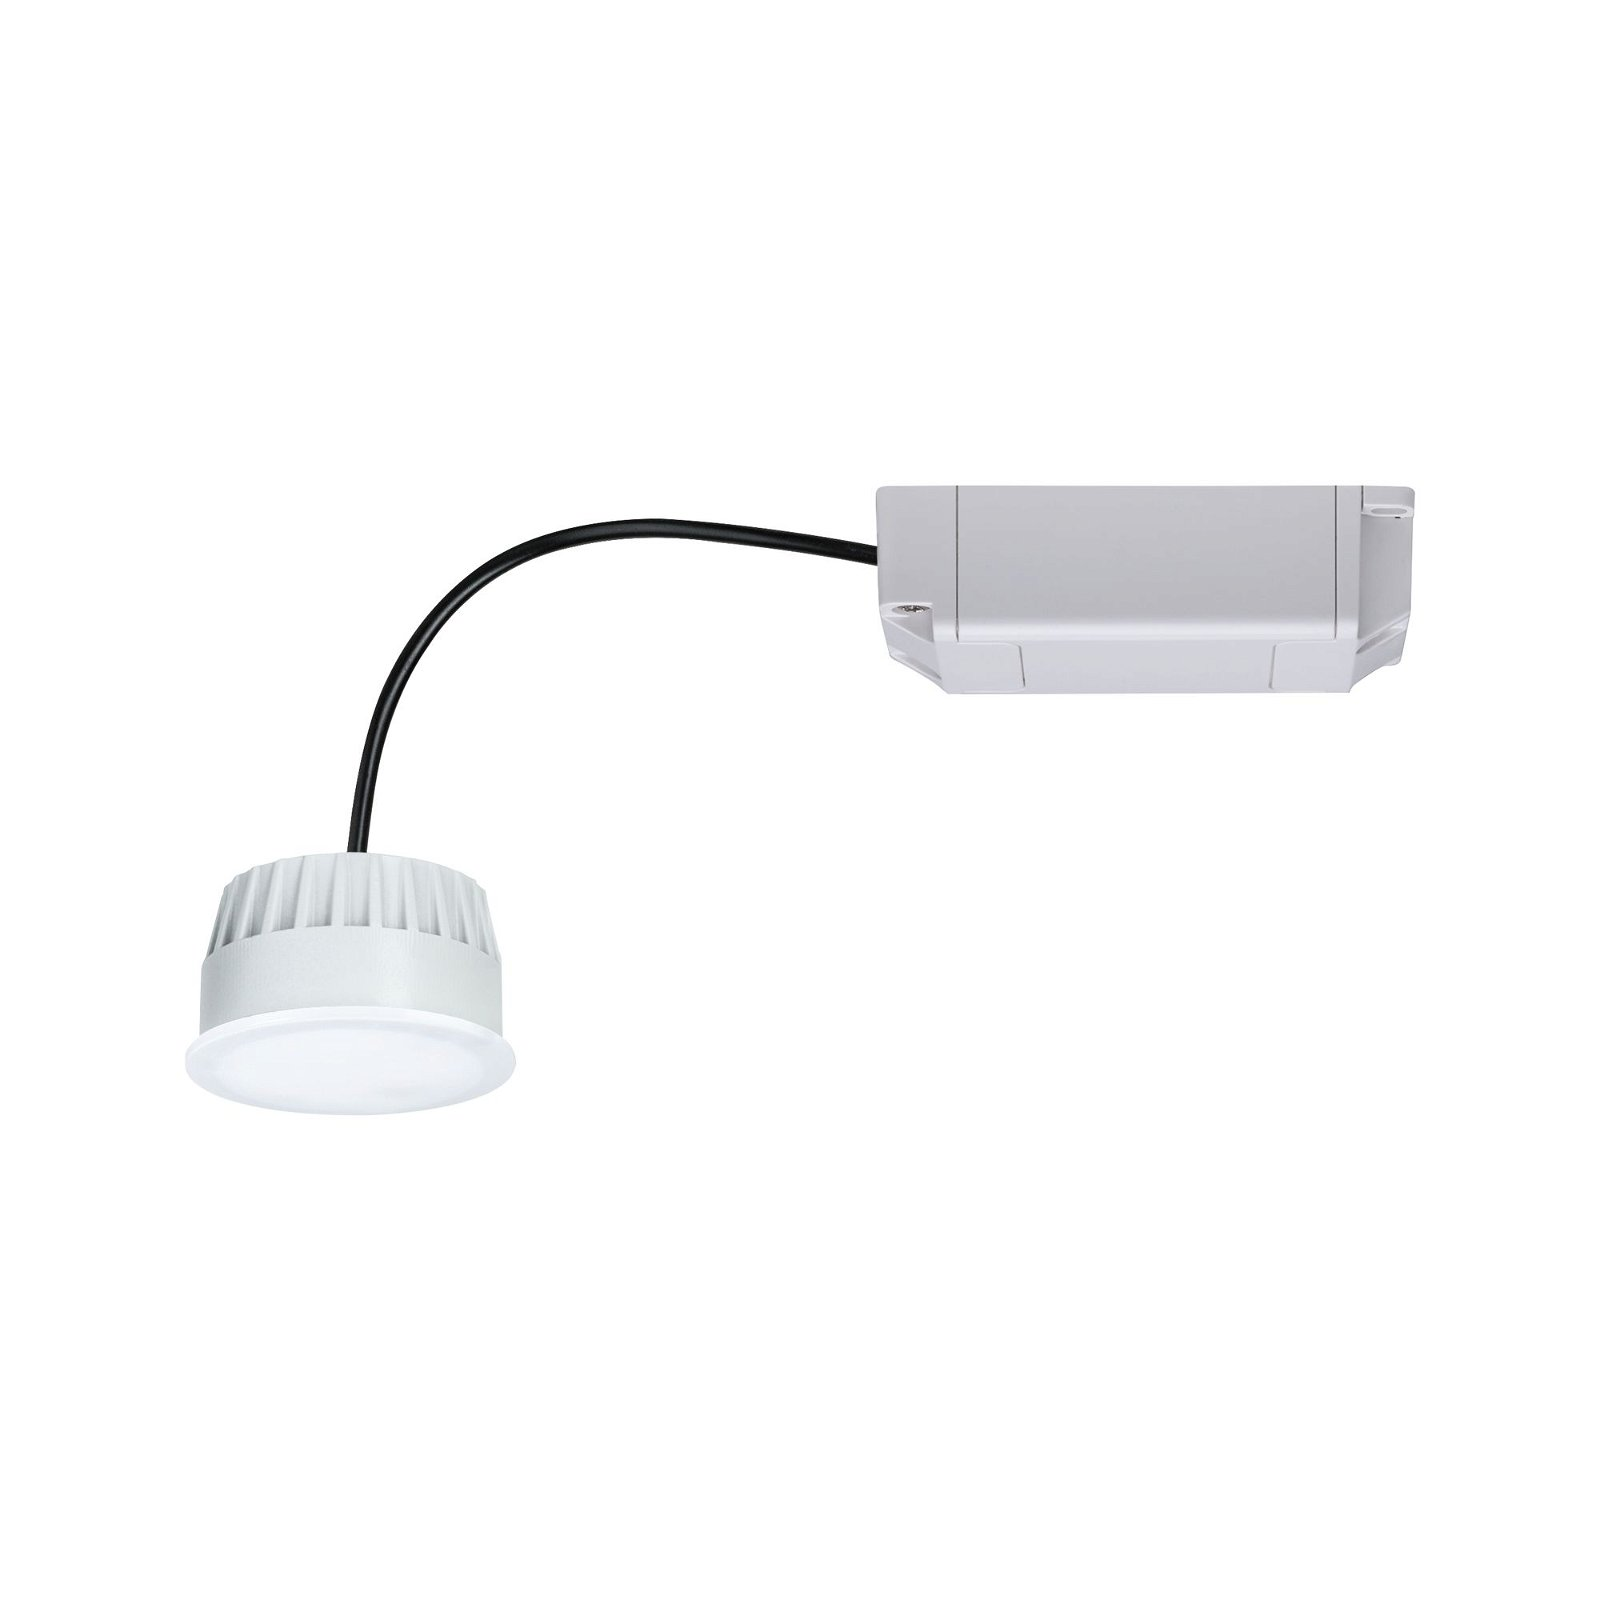 Spot encastré modulaire LED Smart Home Zigbee RGBW Coin rond 50mm Coin 5,2W 400lm 230V RGBW Satiné